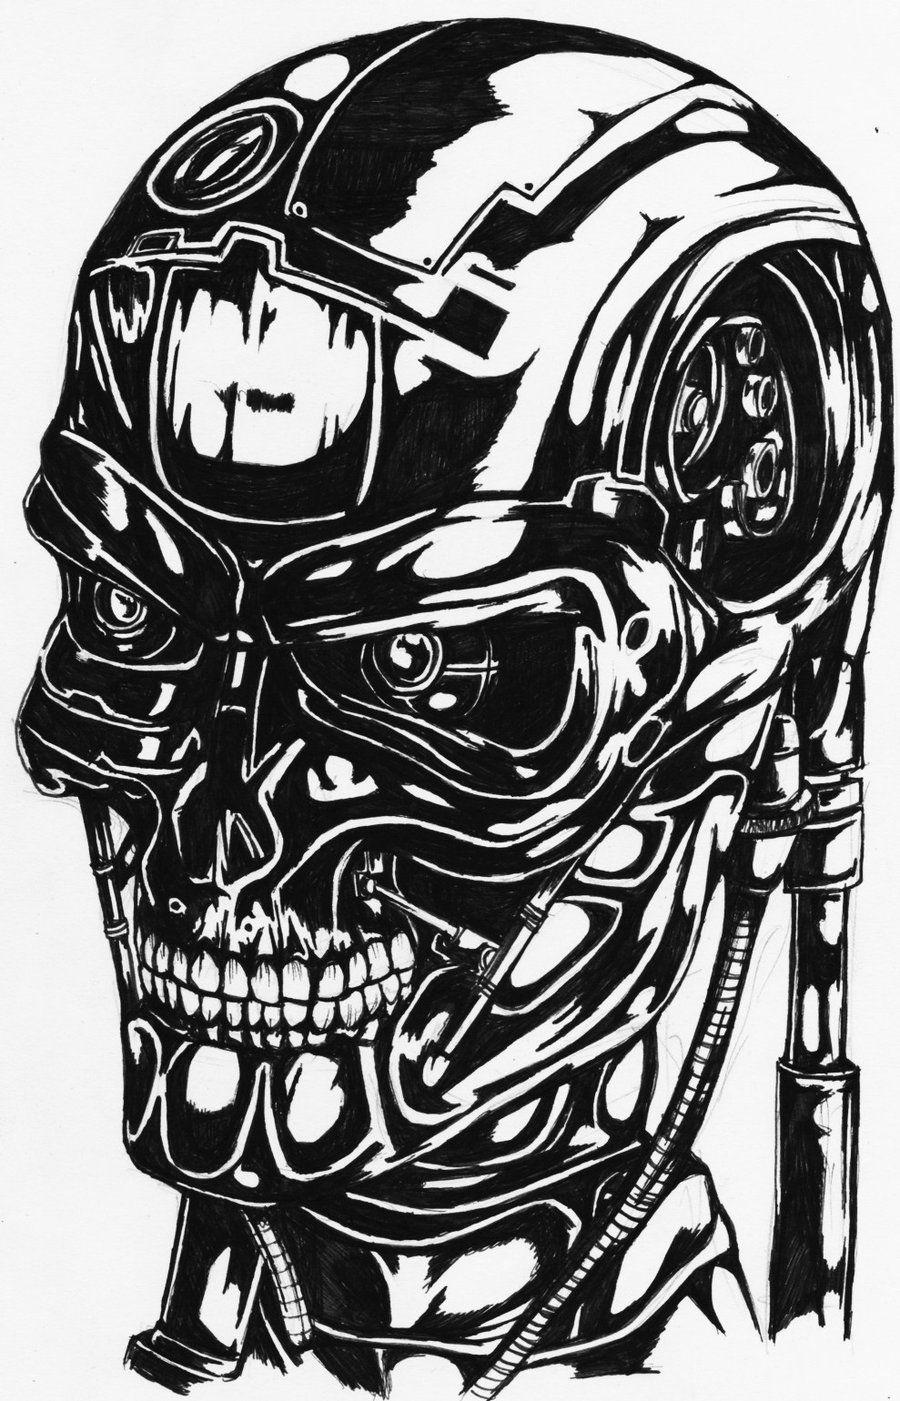 Terminator Portrait By Darkartistdomain Cyborgs Art Art Movie Poster Art